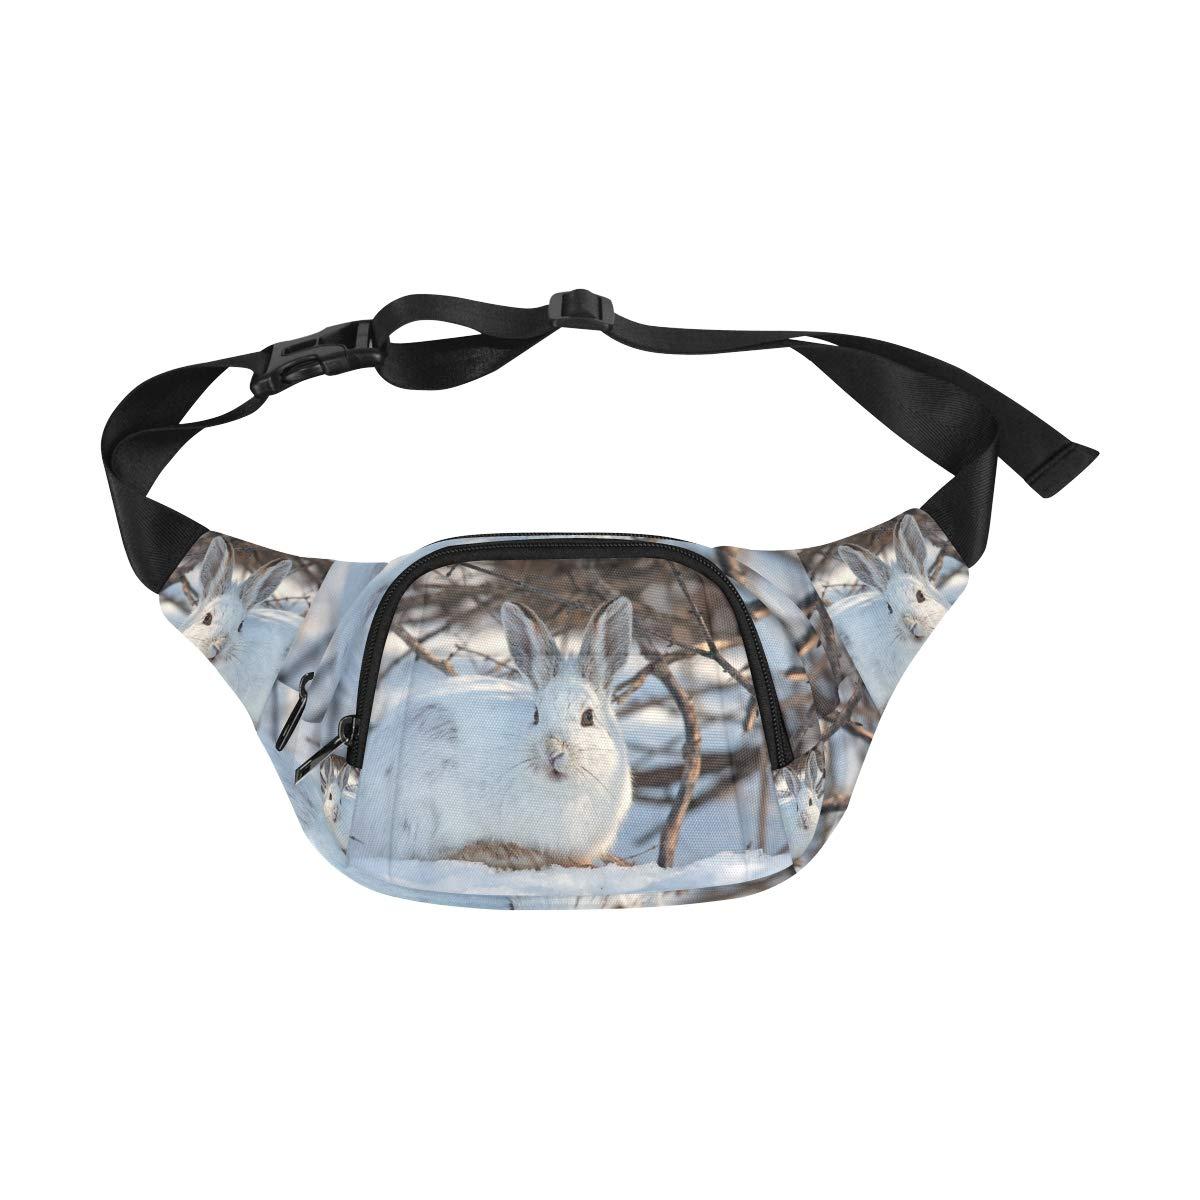 White Snow Hare Rabbit In Winter Fenny Packs Waist Bags Adjustable Belt Waterproof Nylon Travel Running Sport Vacation Party For Men Women Boys Girls Kids